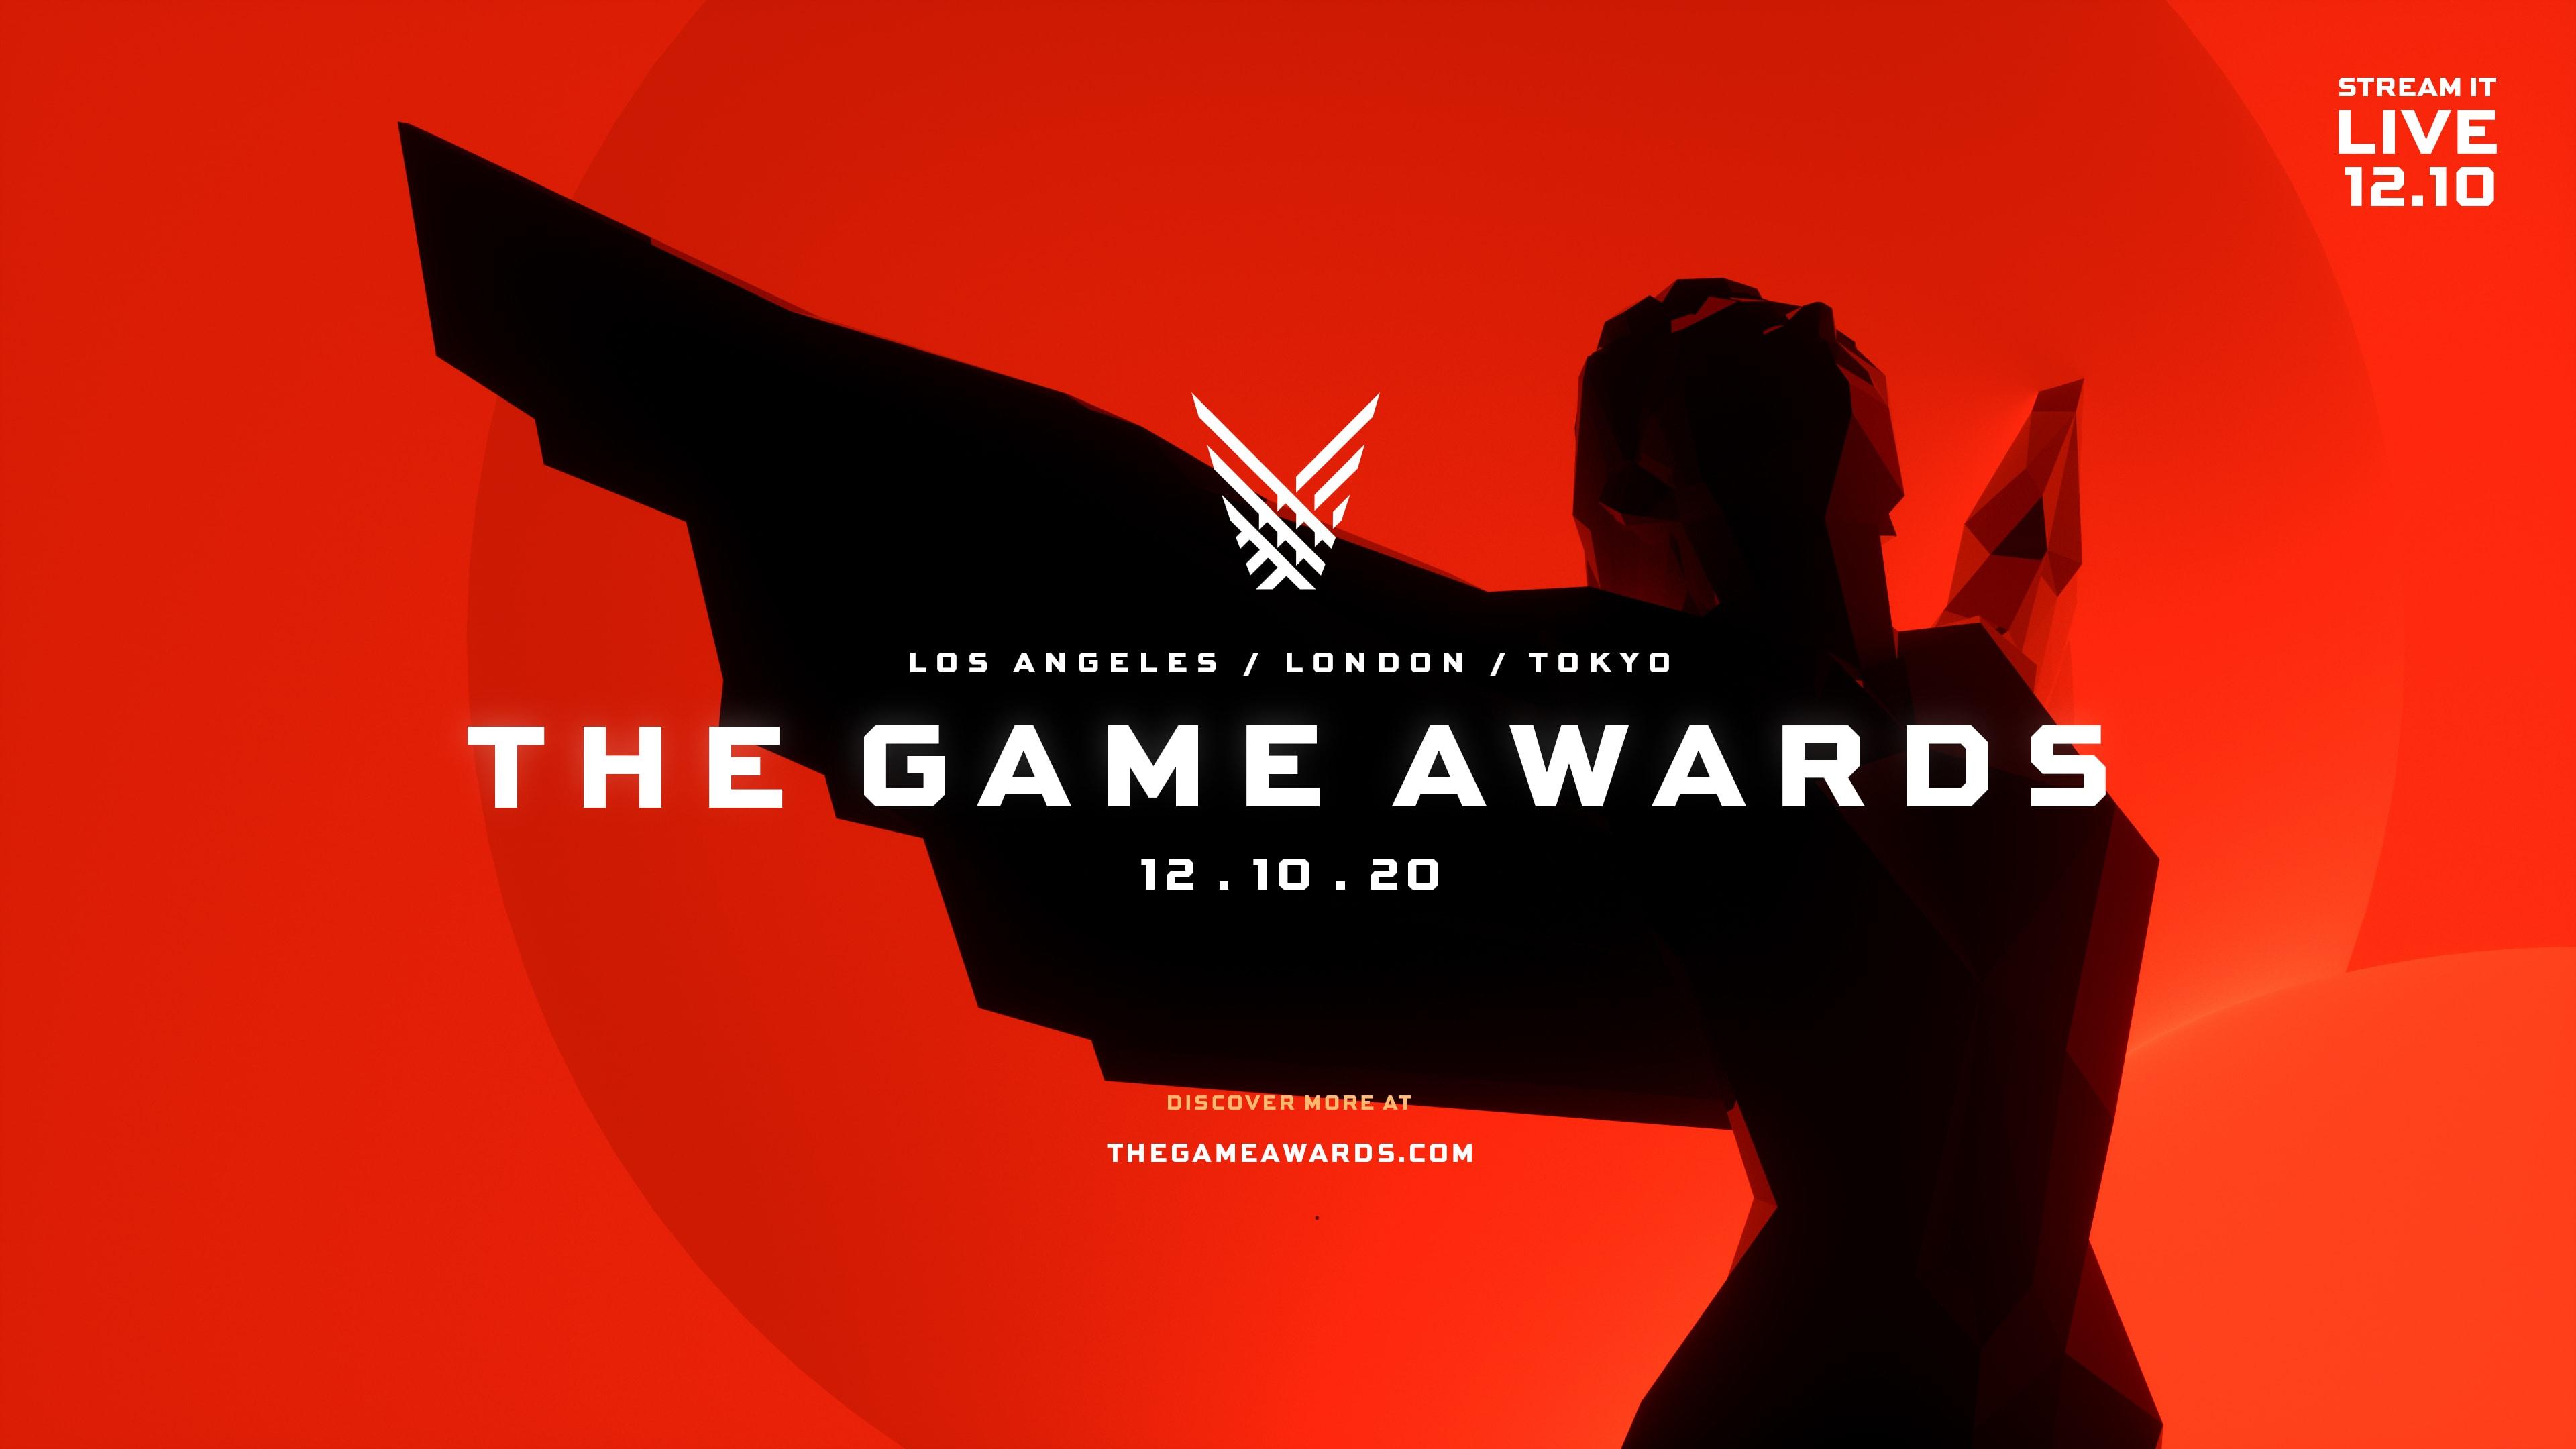 2020TGA:《半条命:艾利克斯》、《无人深空》等VR游戏入选多个奖项提名